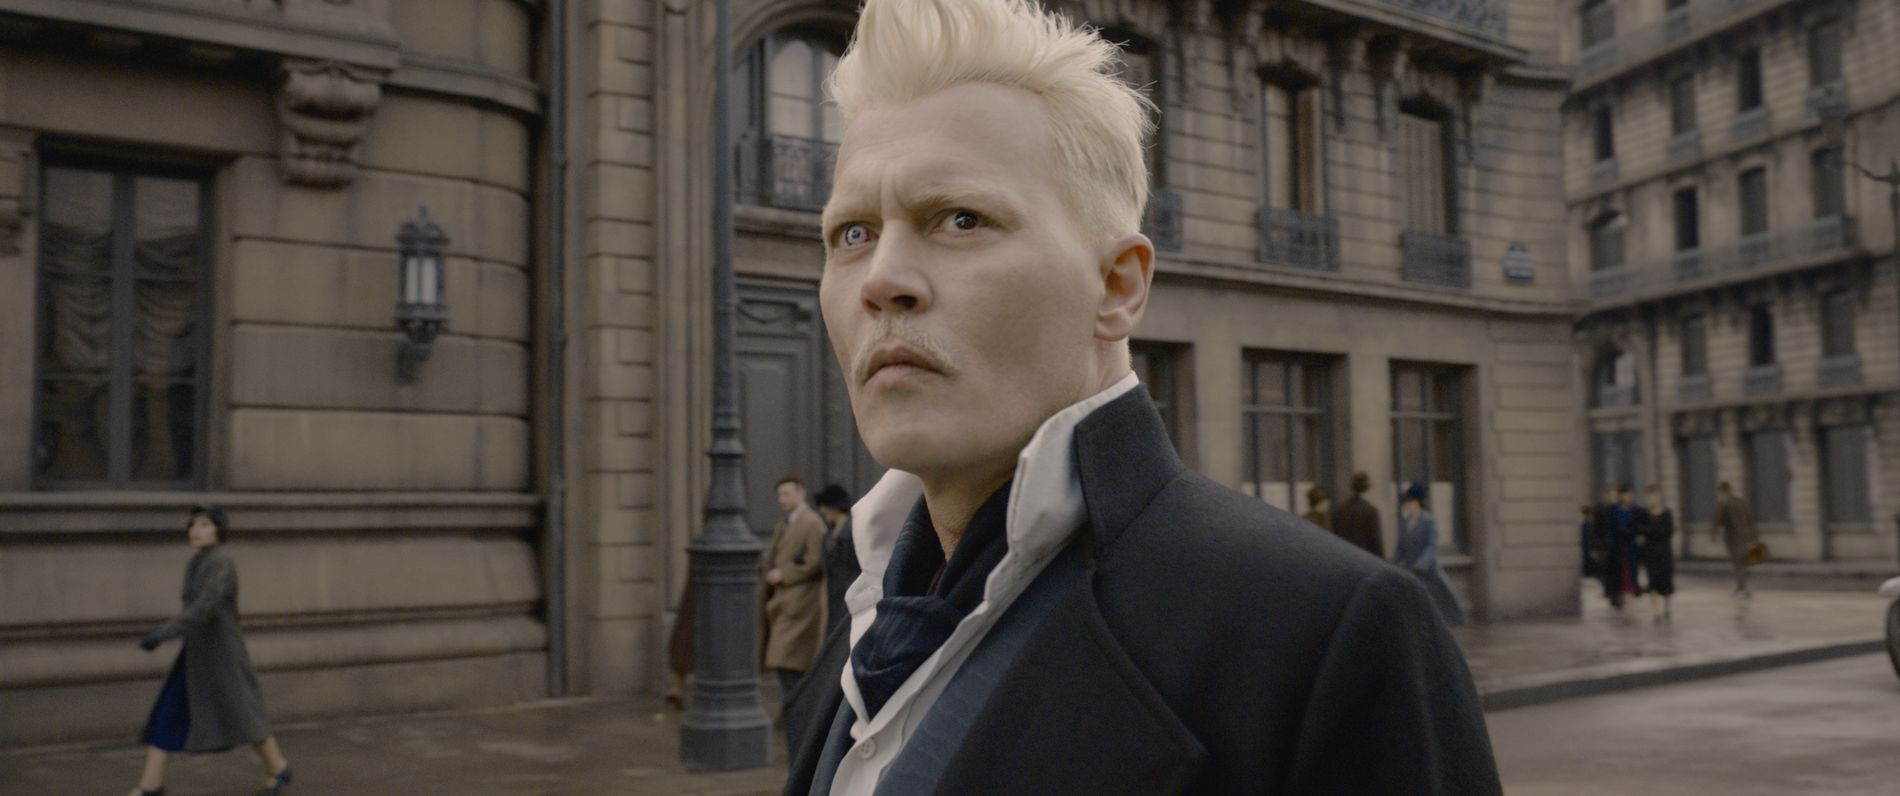 OVERMENNESKE: Gellert Grindelwald (Johnny Depp) ser helst at magiske personer styrer over oss vanlige dødelige.